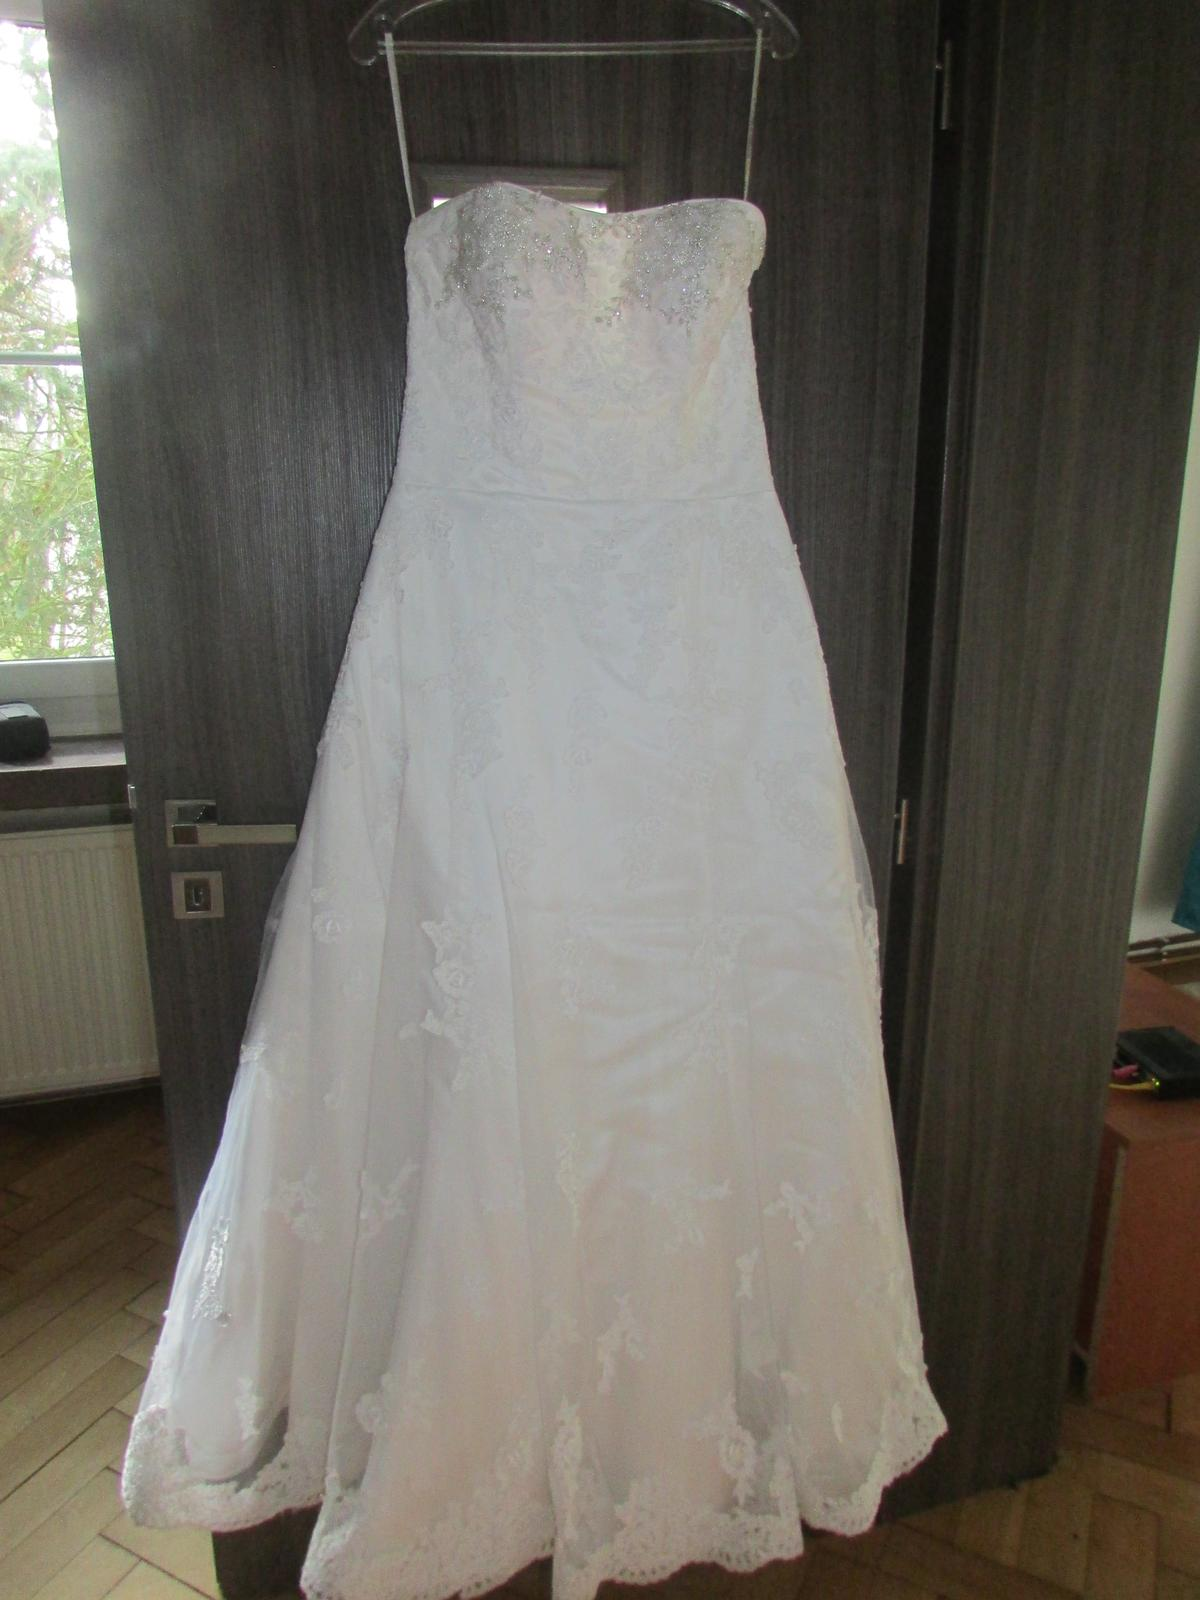 svadobné šaty s čipkovanou vlečkou - Obrázok č. 1